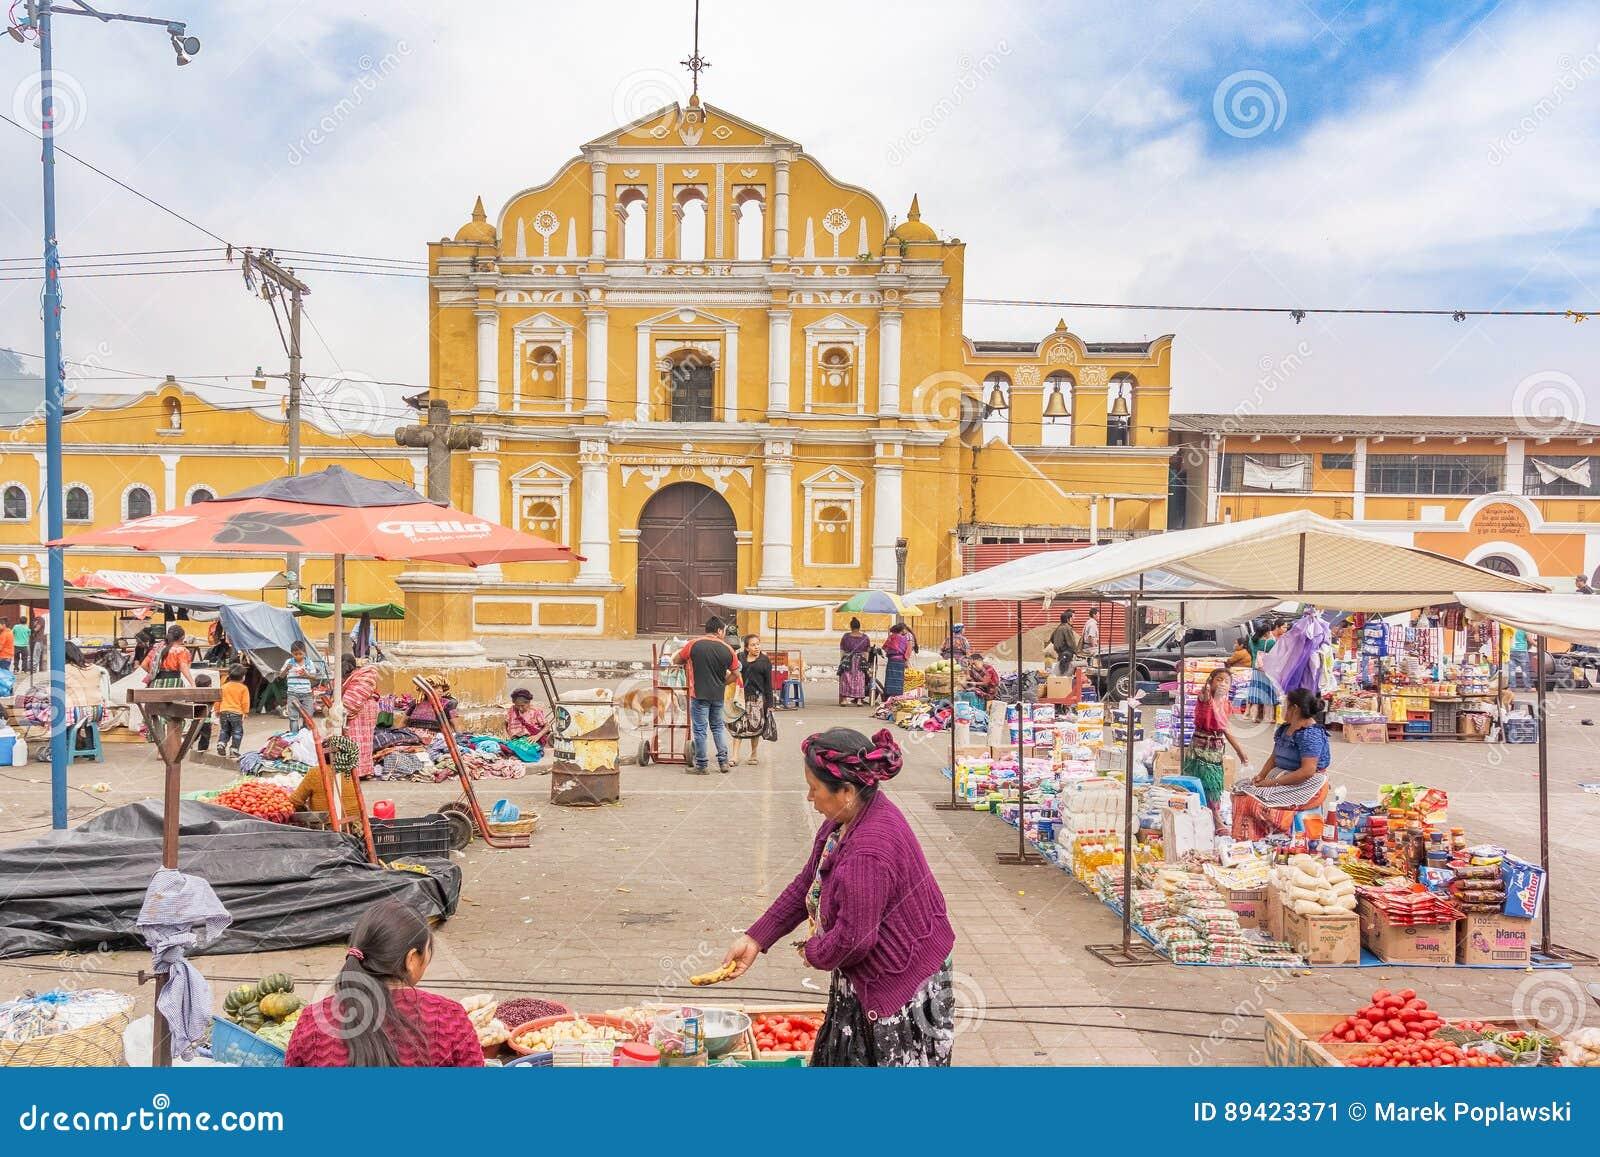 Fachada da igreja Católica de Santa Maria de Jesus em Guatema